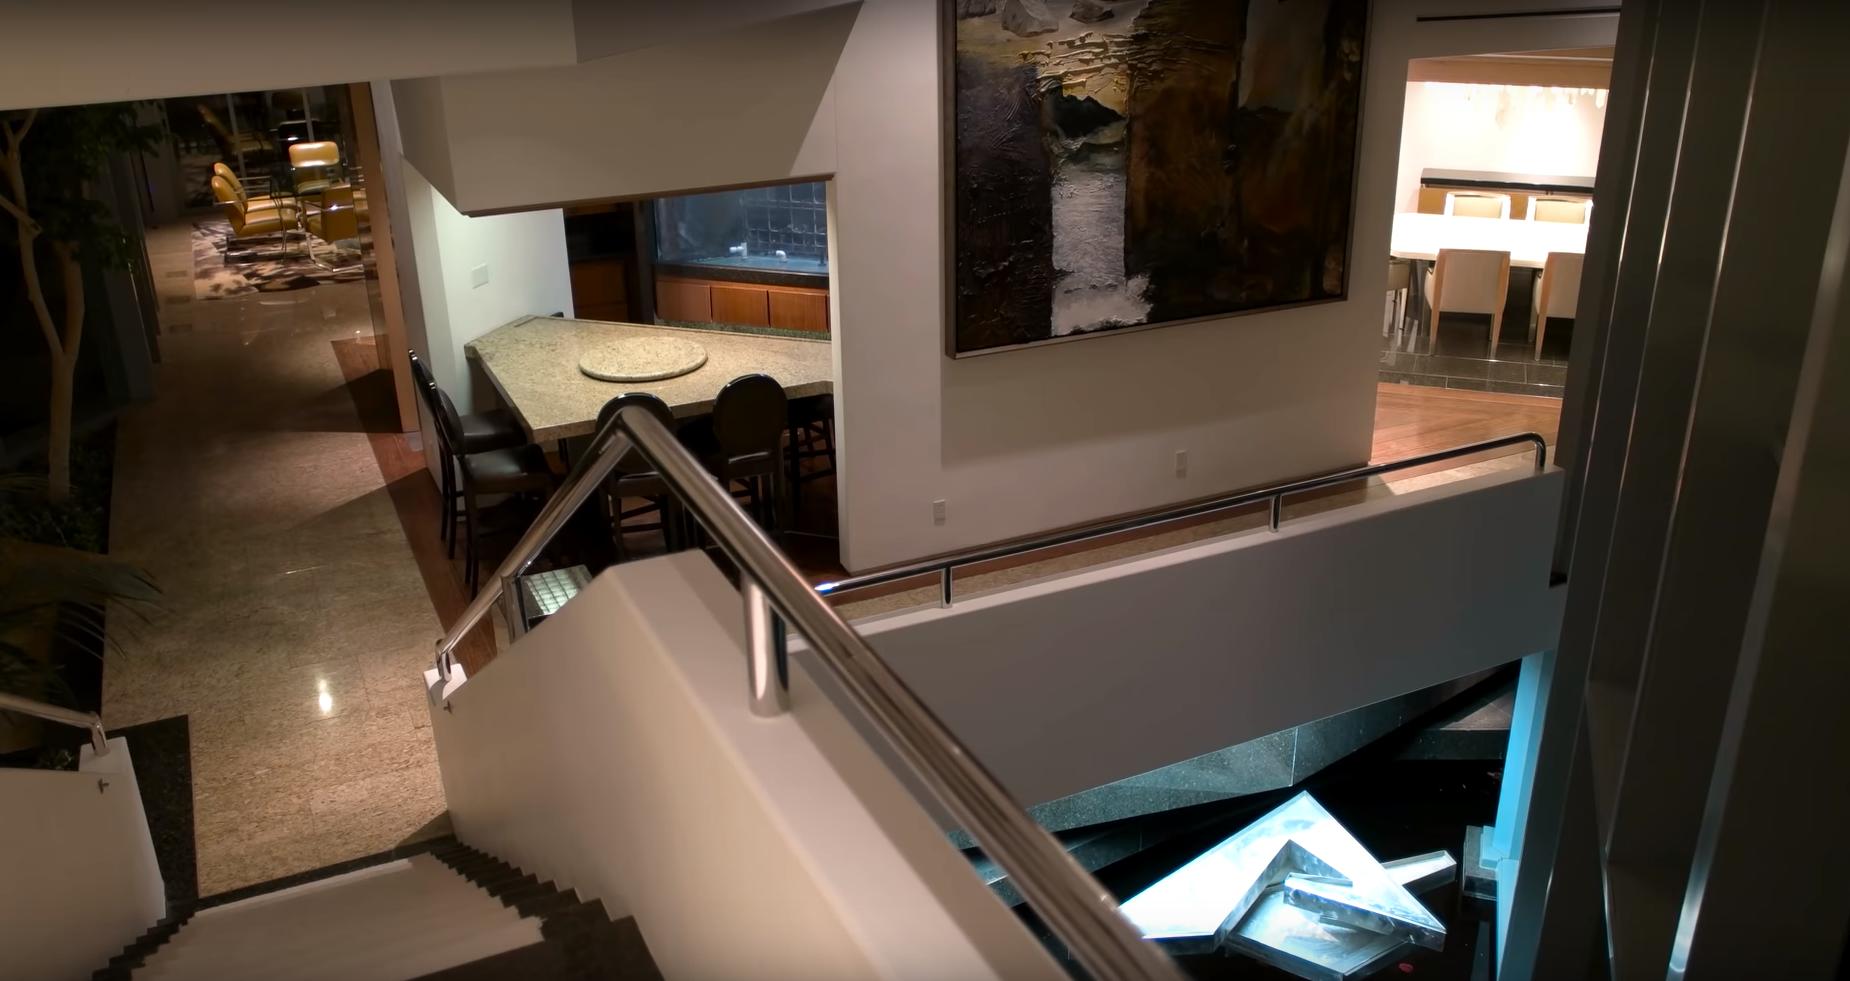 Pharrell Williams' open floor plan